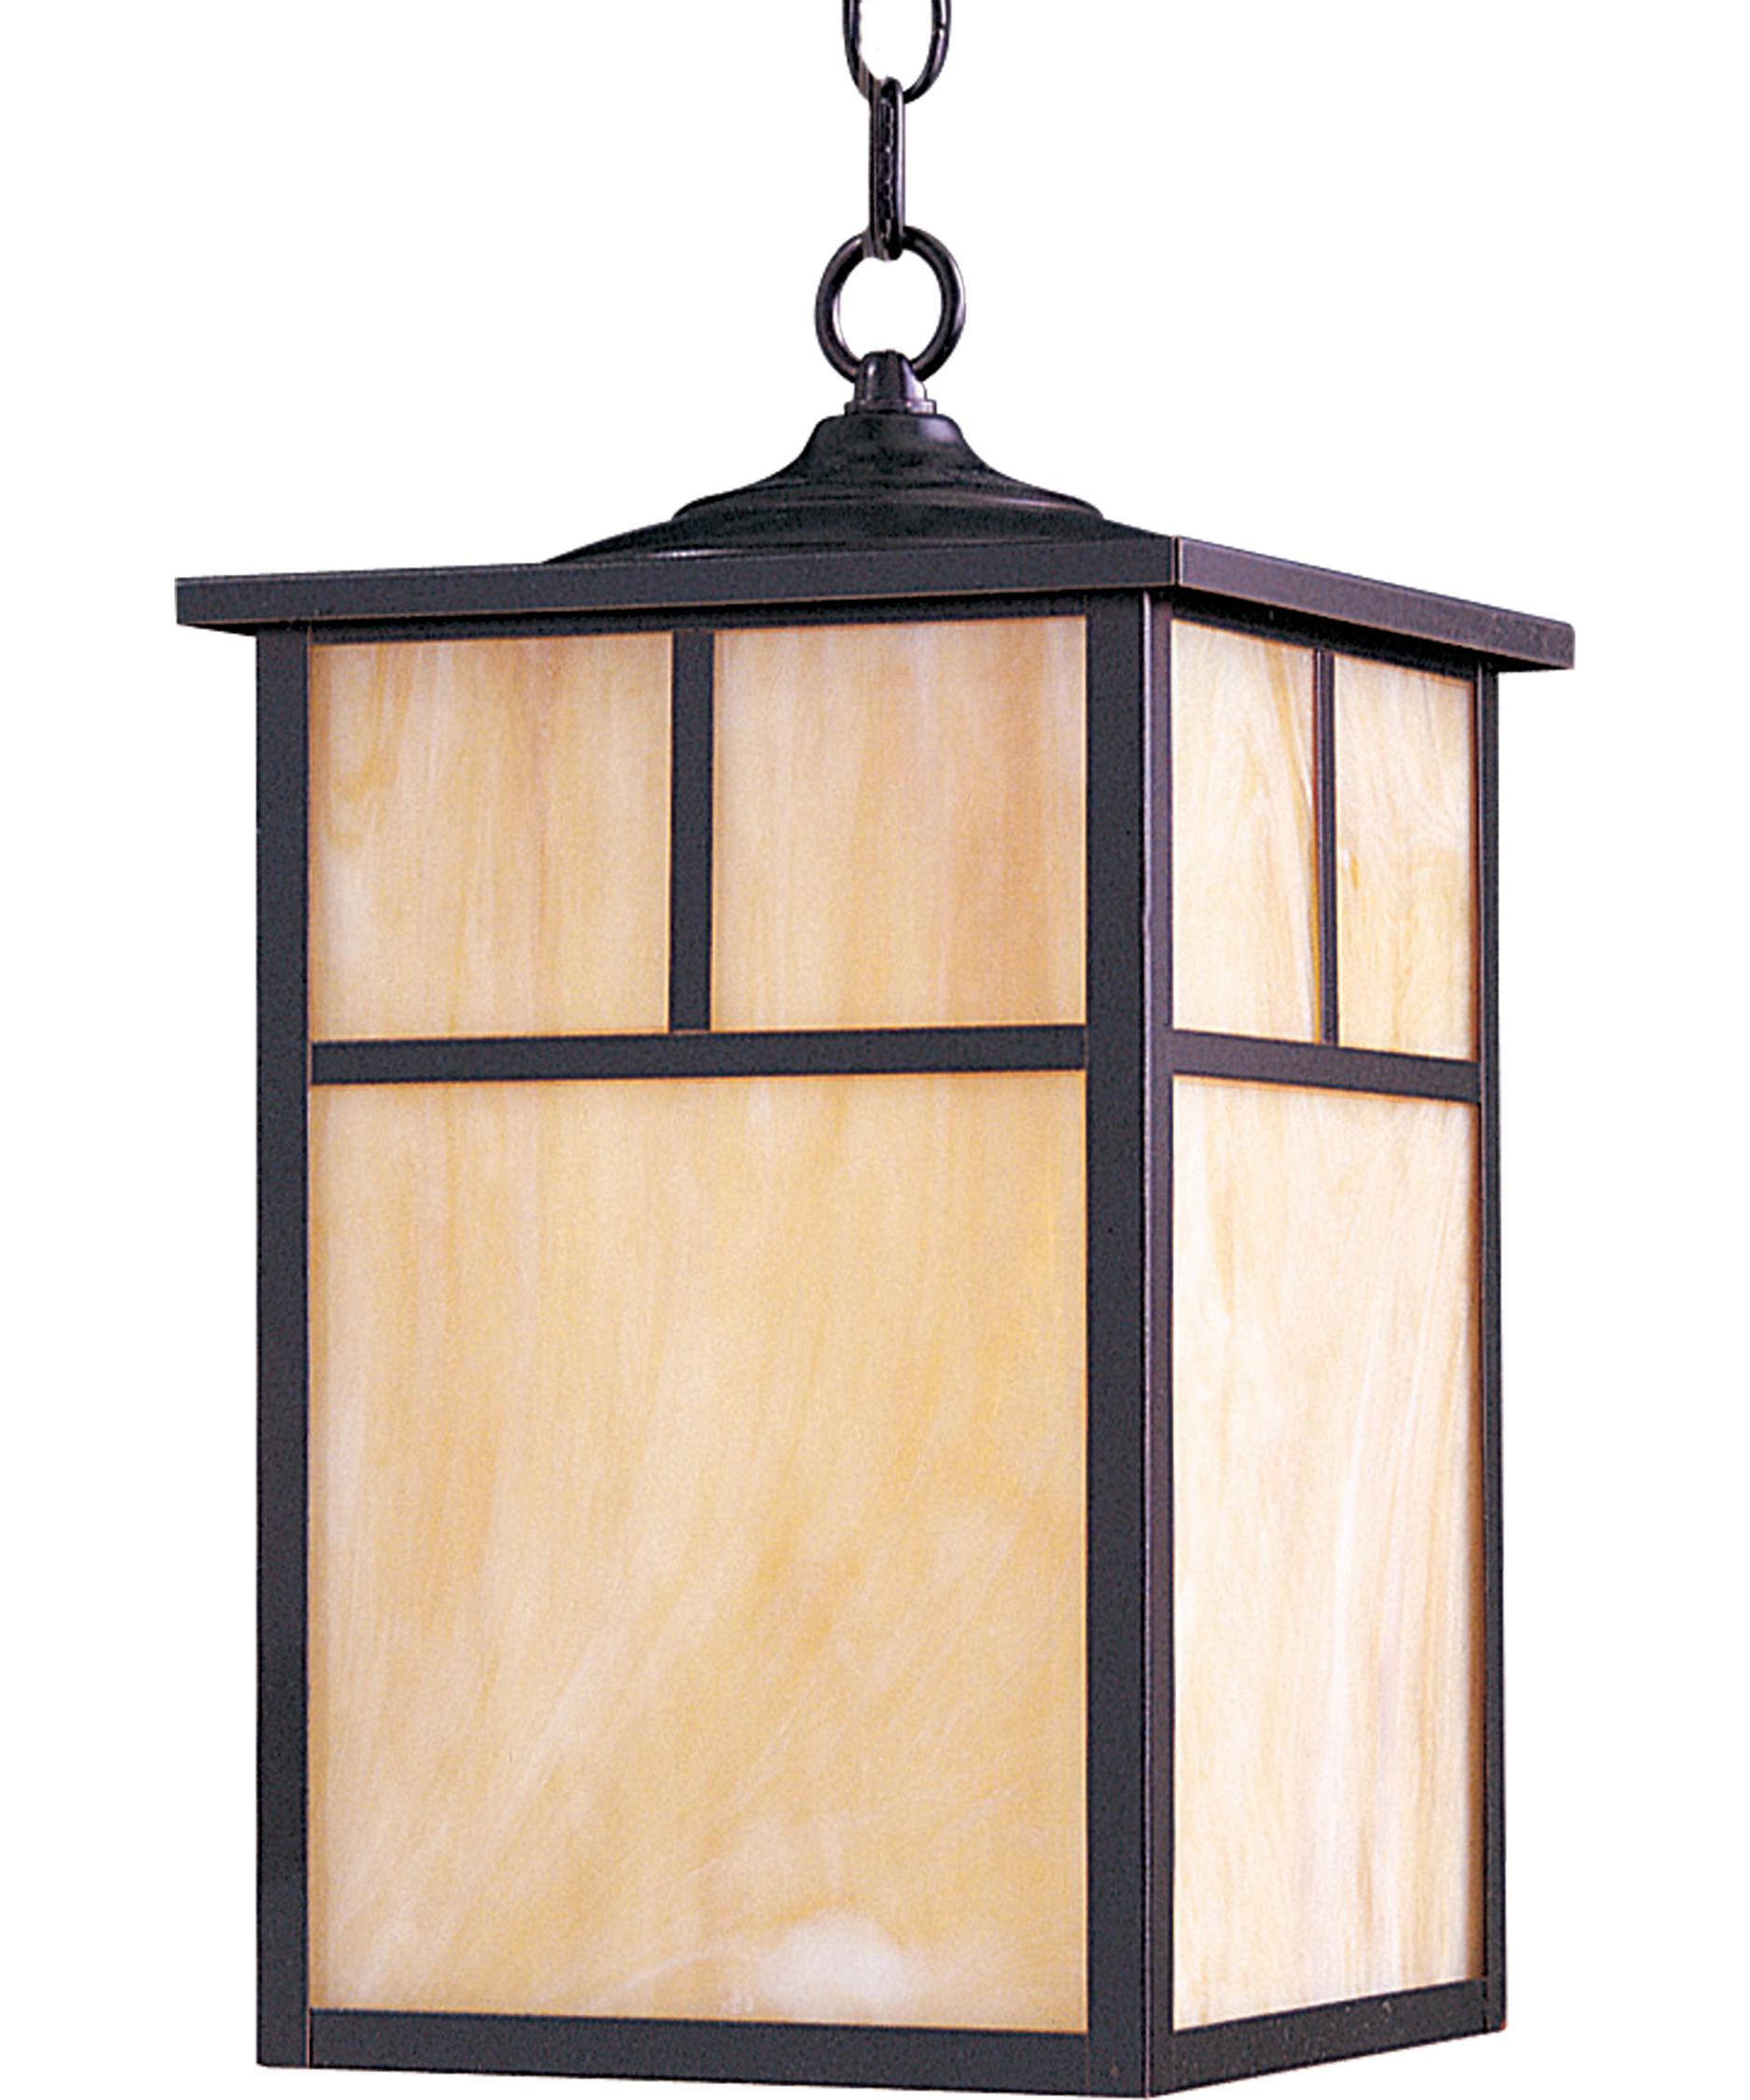 Maxim Lighting 4058 Craftsman 9 Inch Wide 1 Light Outdoor Hanging Lantern Capitol Lighting 1 800lighting Com